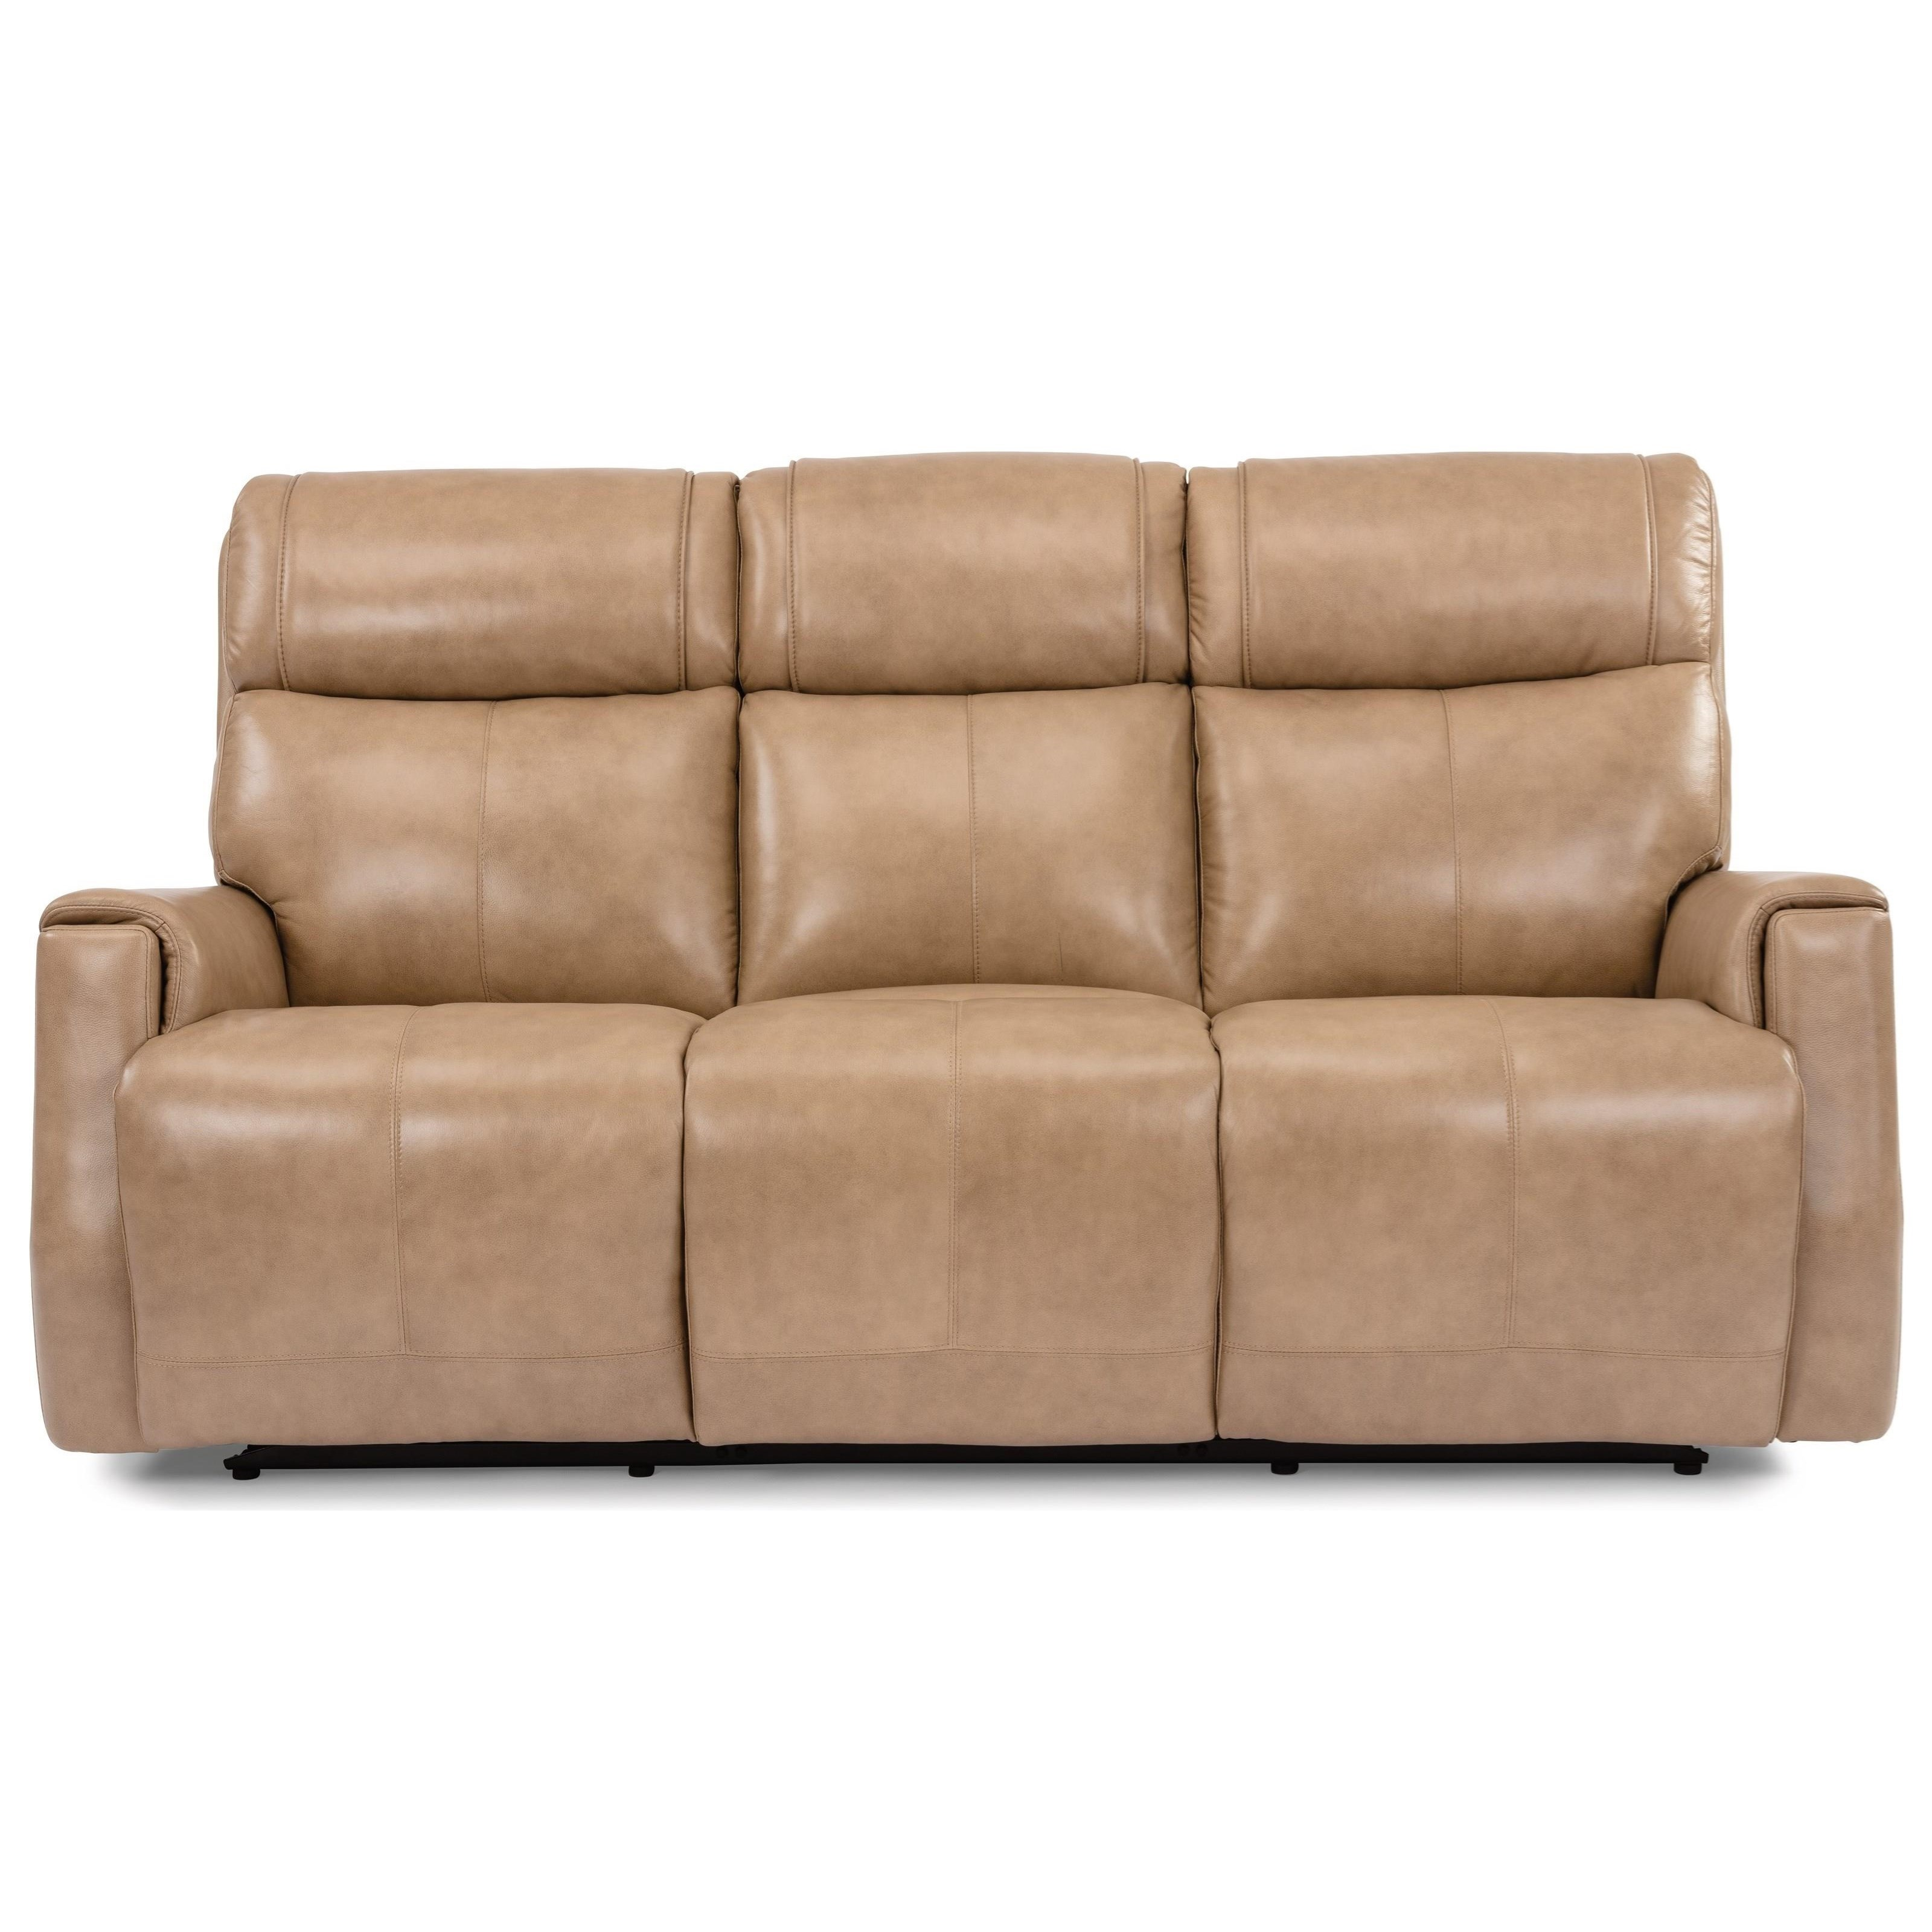 Latitudes - Holton Power Reclining Sofa by Flexsteel at Zak's Home